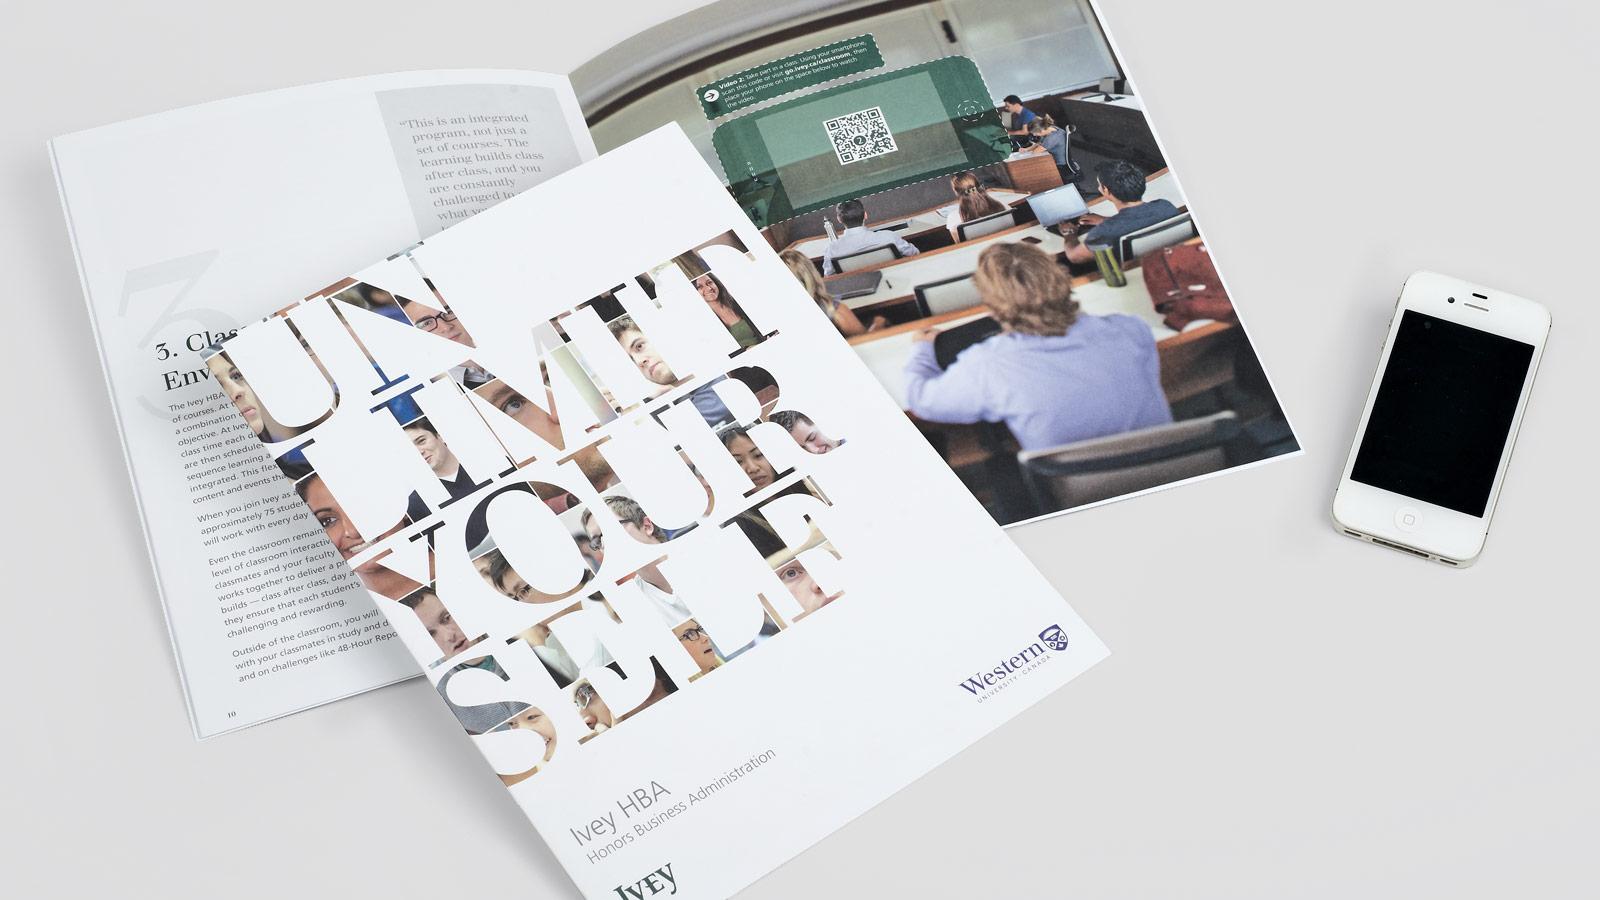 Ivey Business School at Western University | Interactive HBA Brochure | Advertising, Brand Strategy, Branding, Digital Innovation, Digital Marketing, Mobile, Social Media